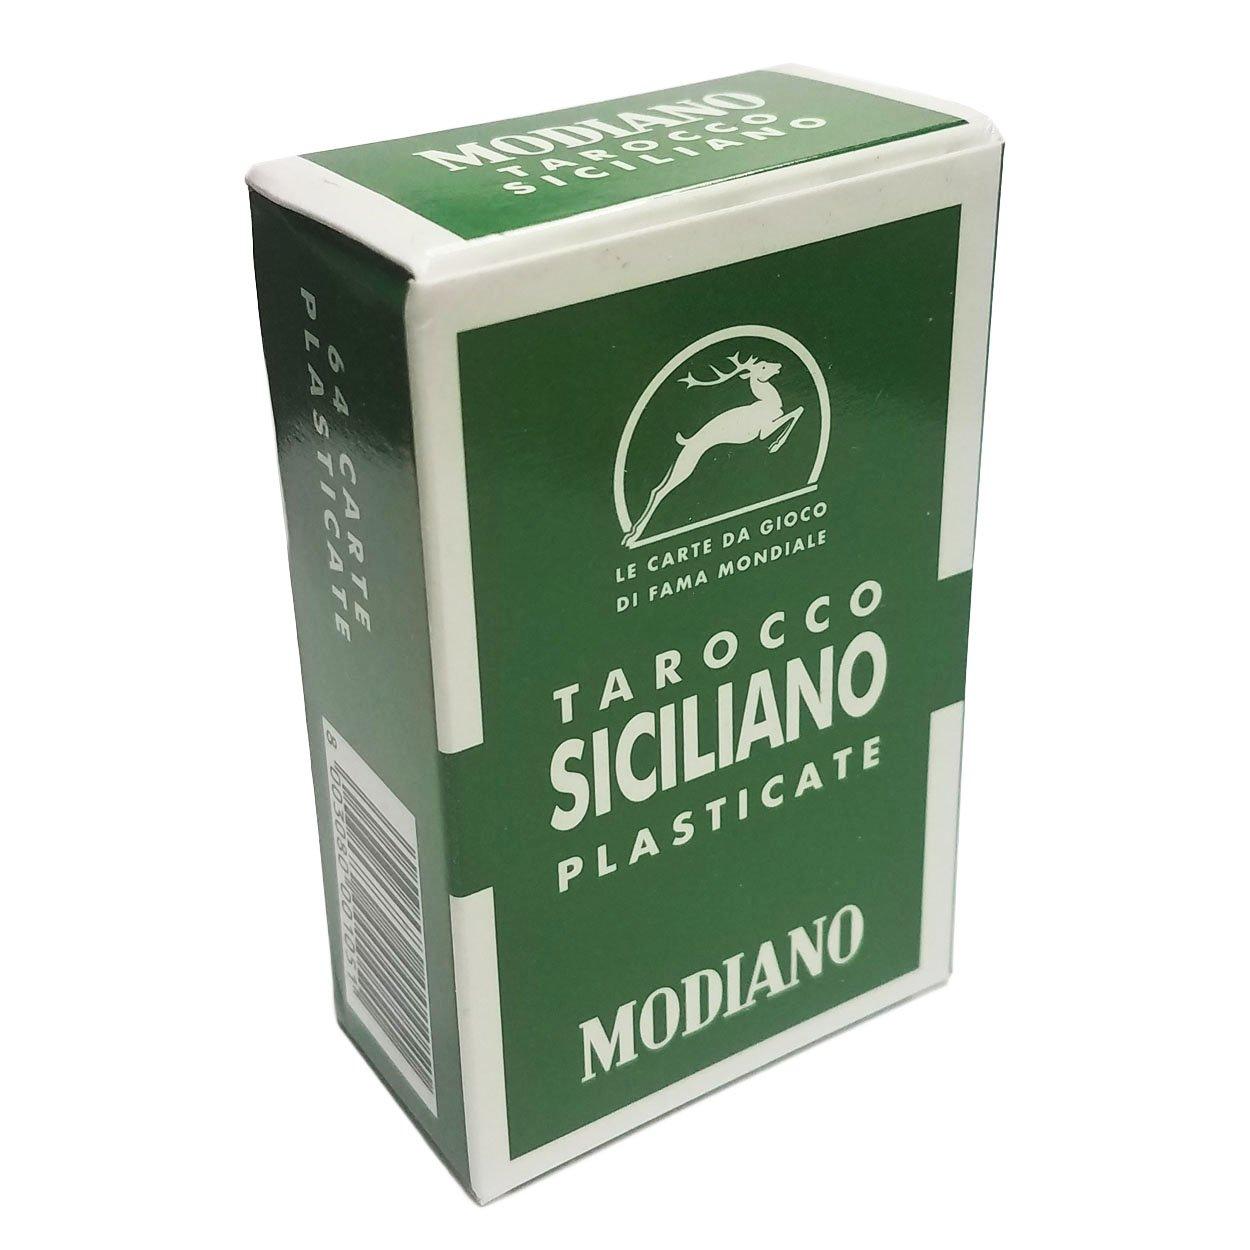 Tarocco Siciliano - Sicilian Tarot Cards